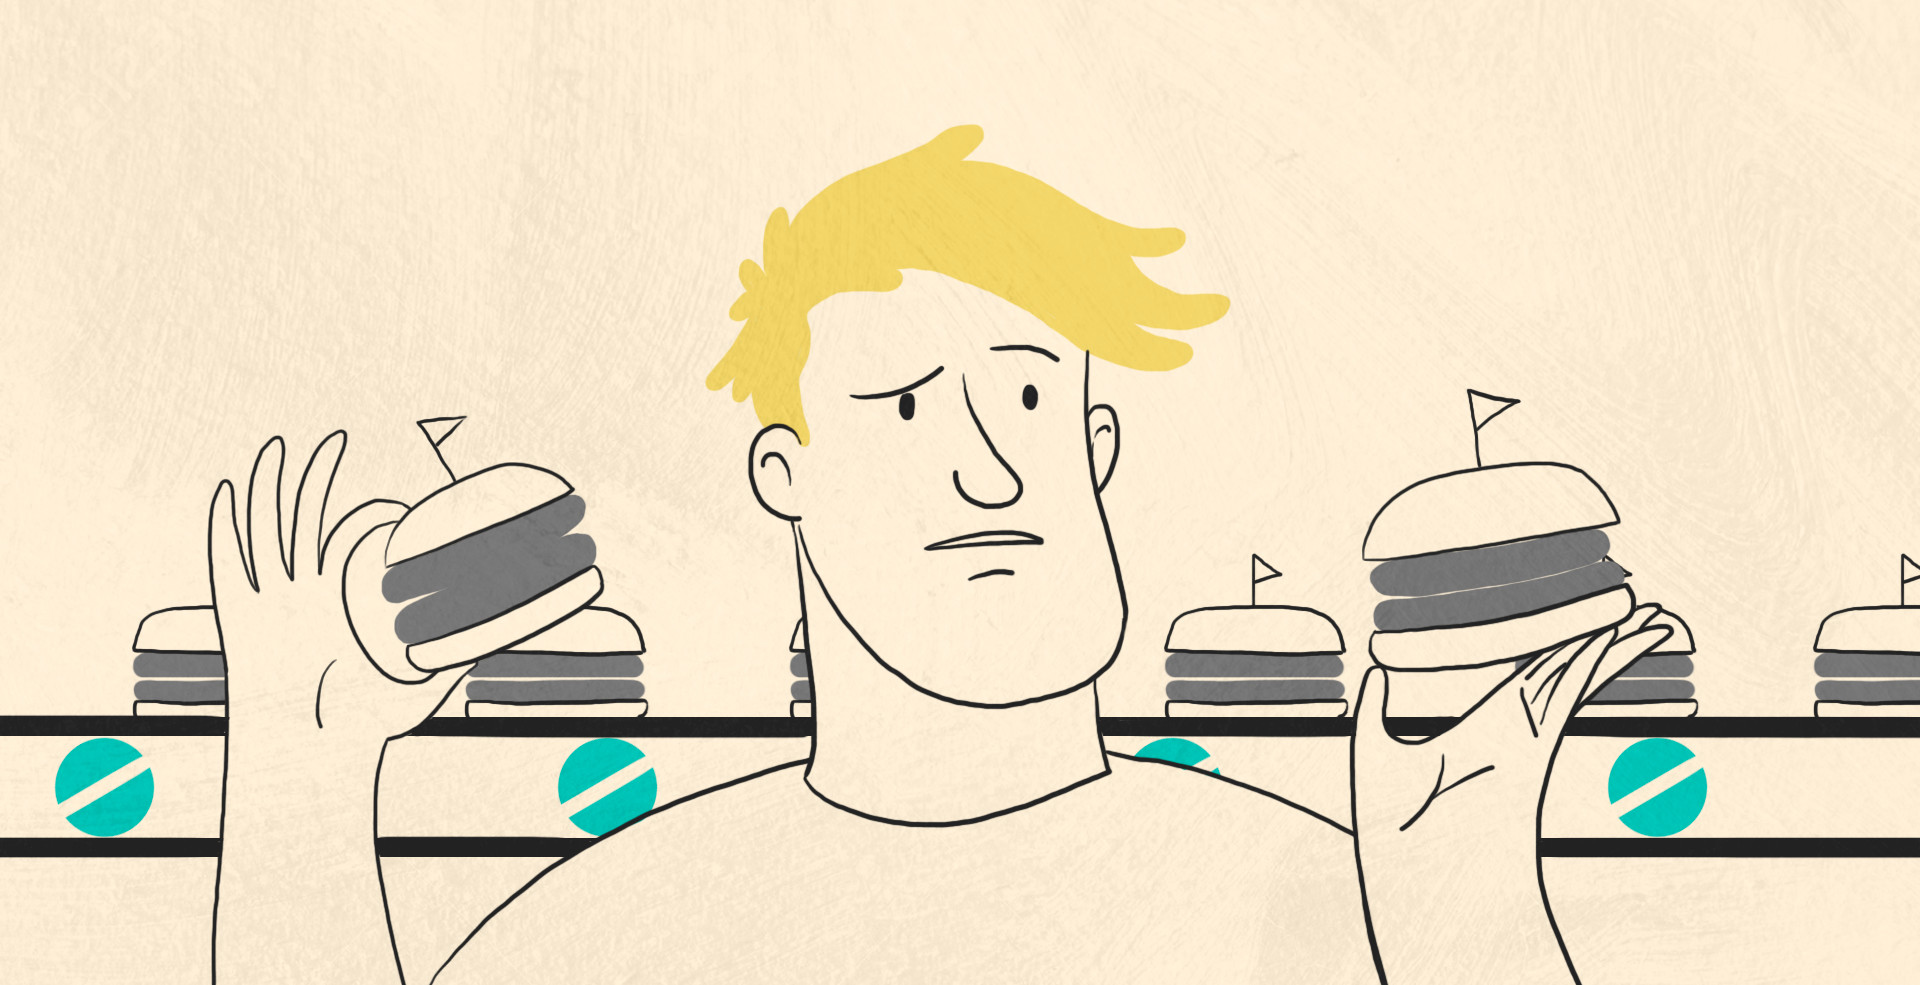 David with Burgers